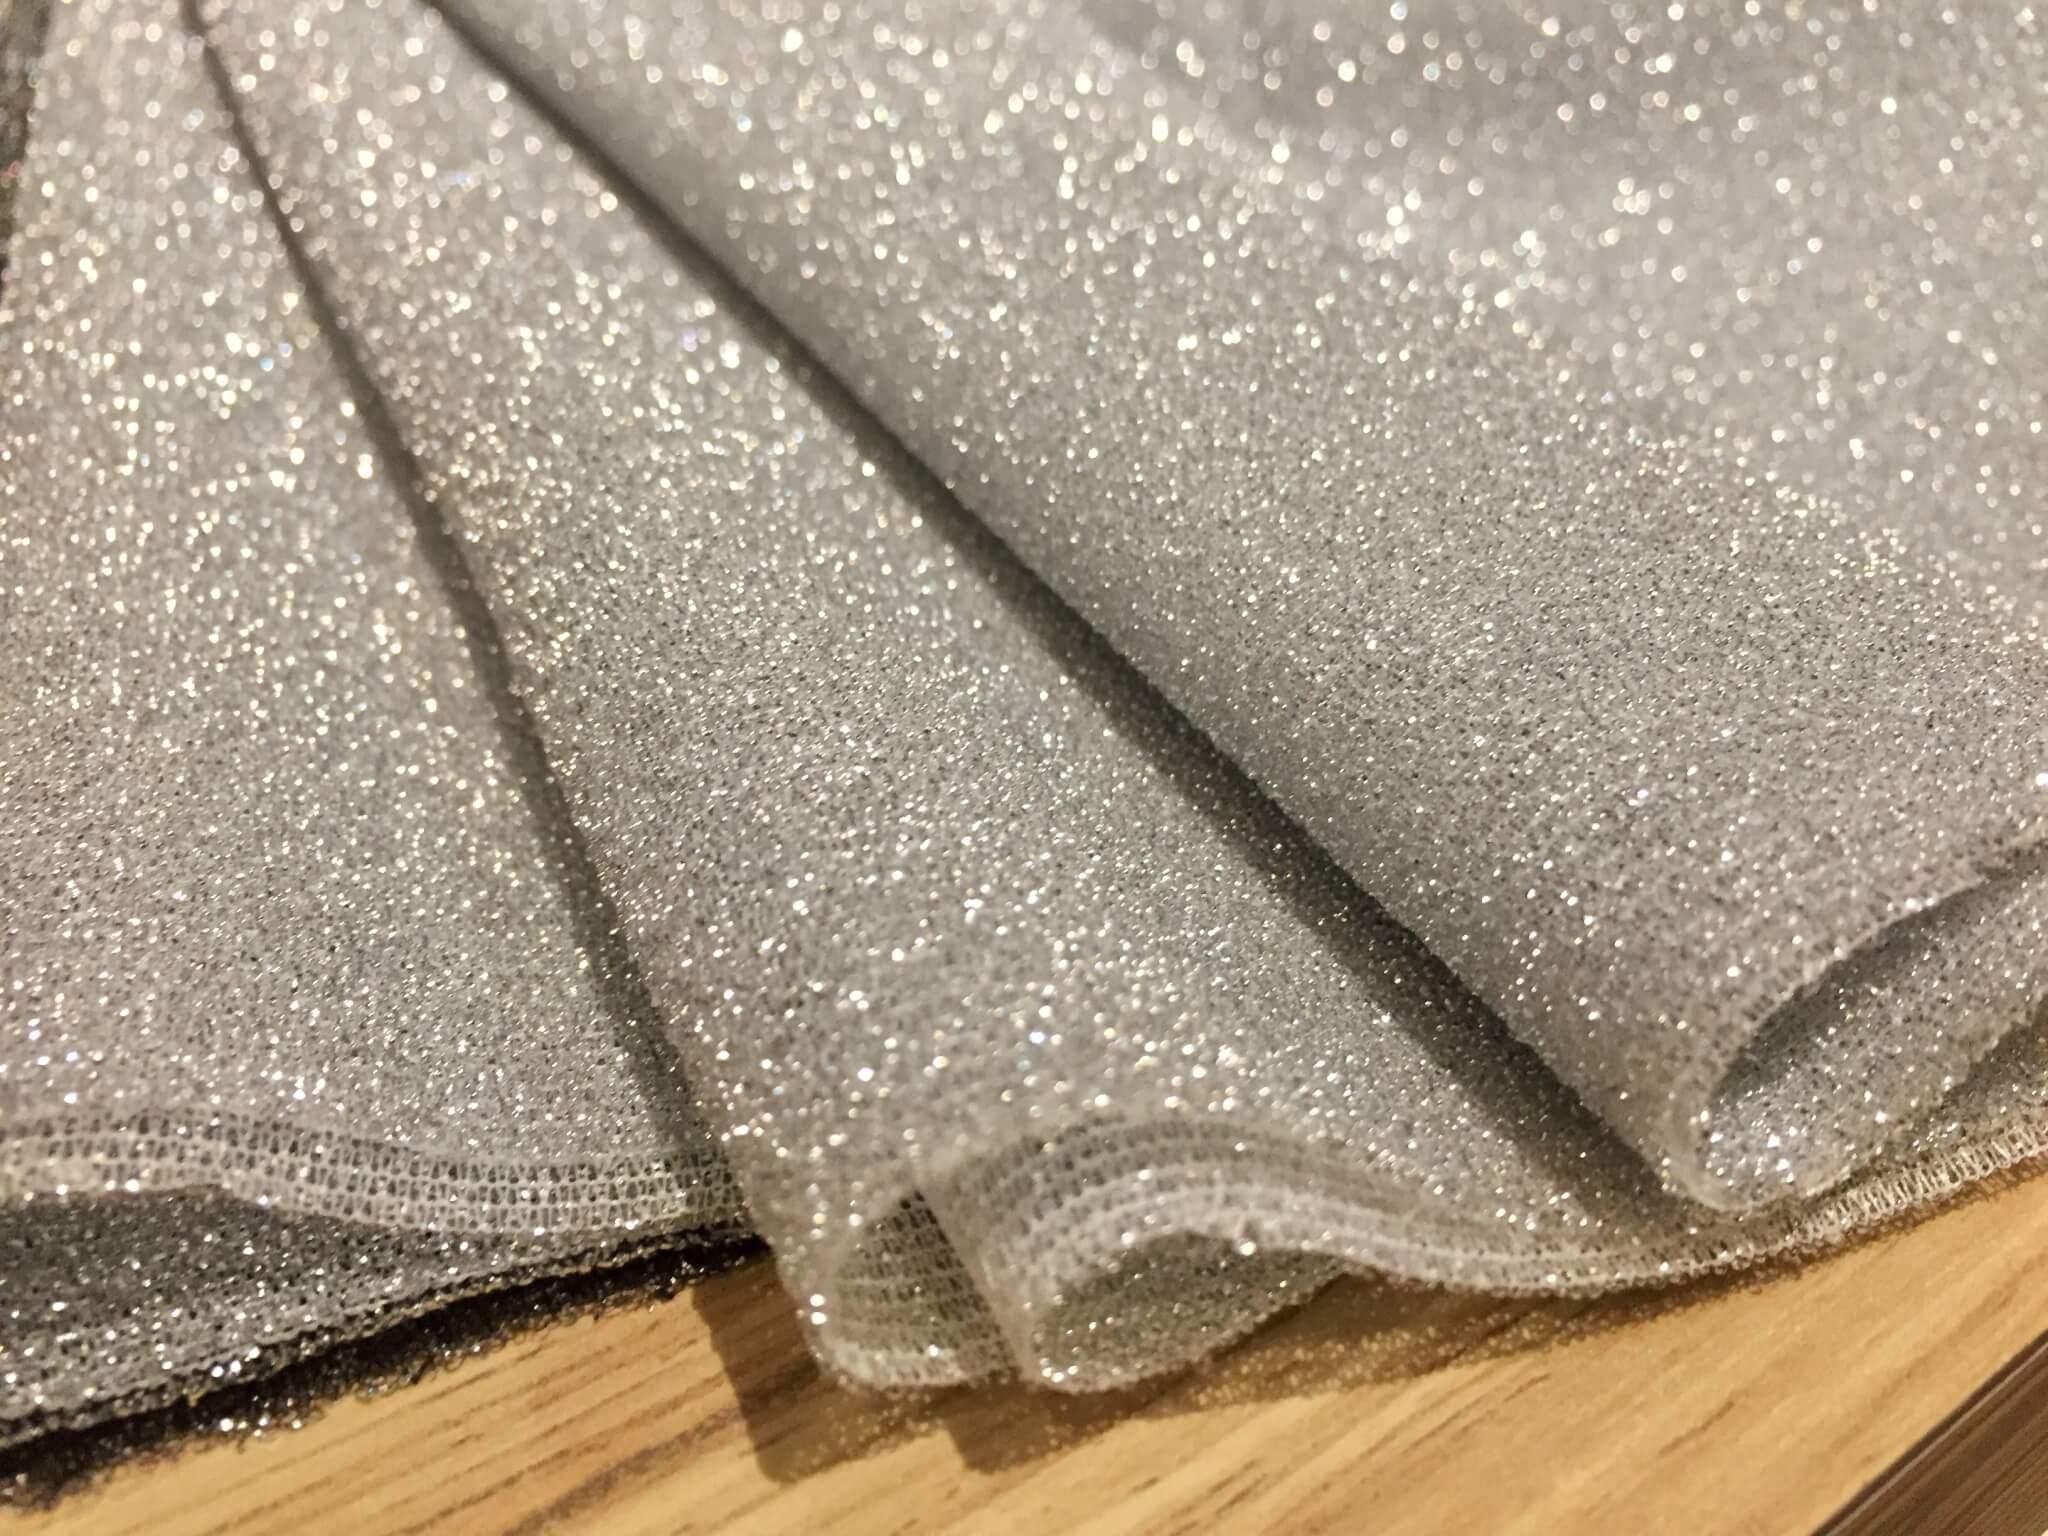 ba39edcb186 Lightweight Metallic Lurex Fabric Stretch Jersey Material – Sparkling  SILVER Glitter – 150cm wide